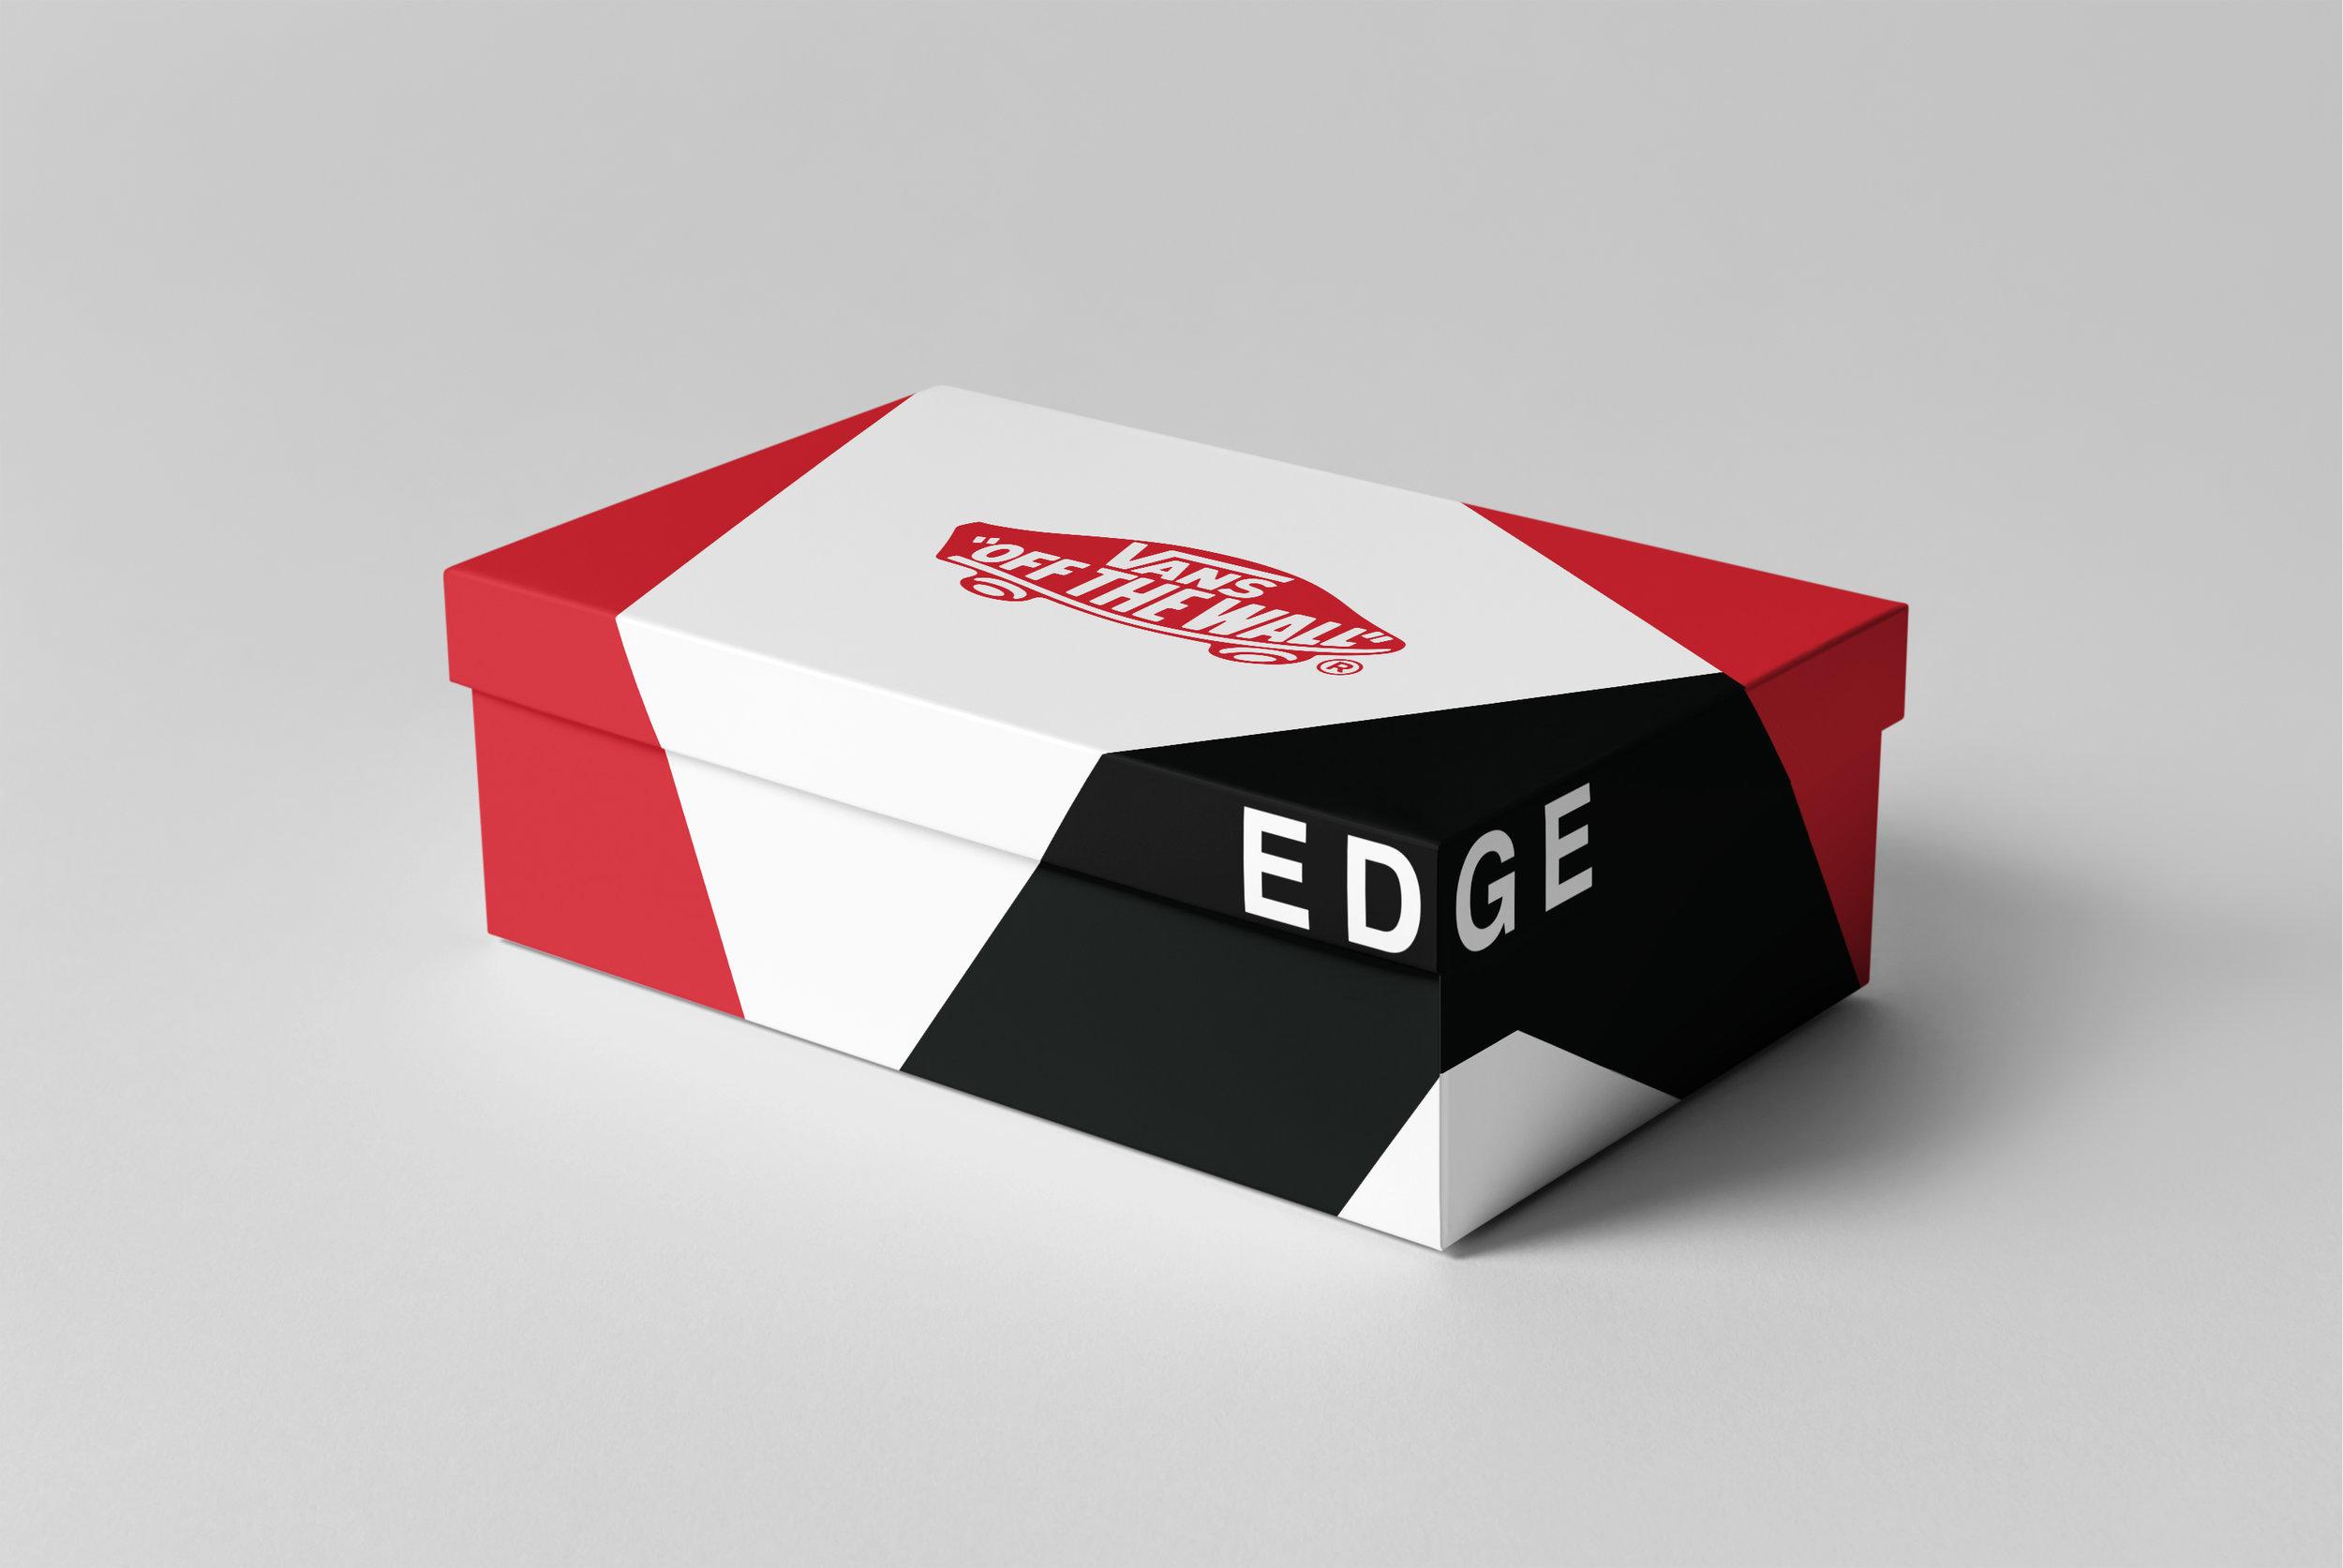 Edge Box.jpg